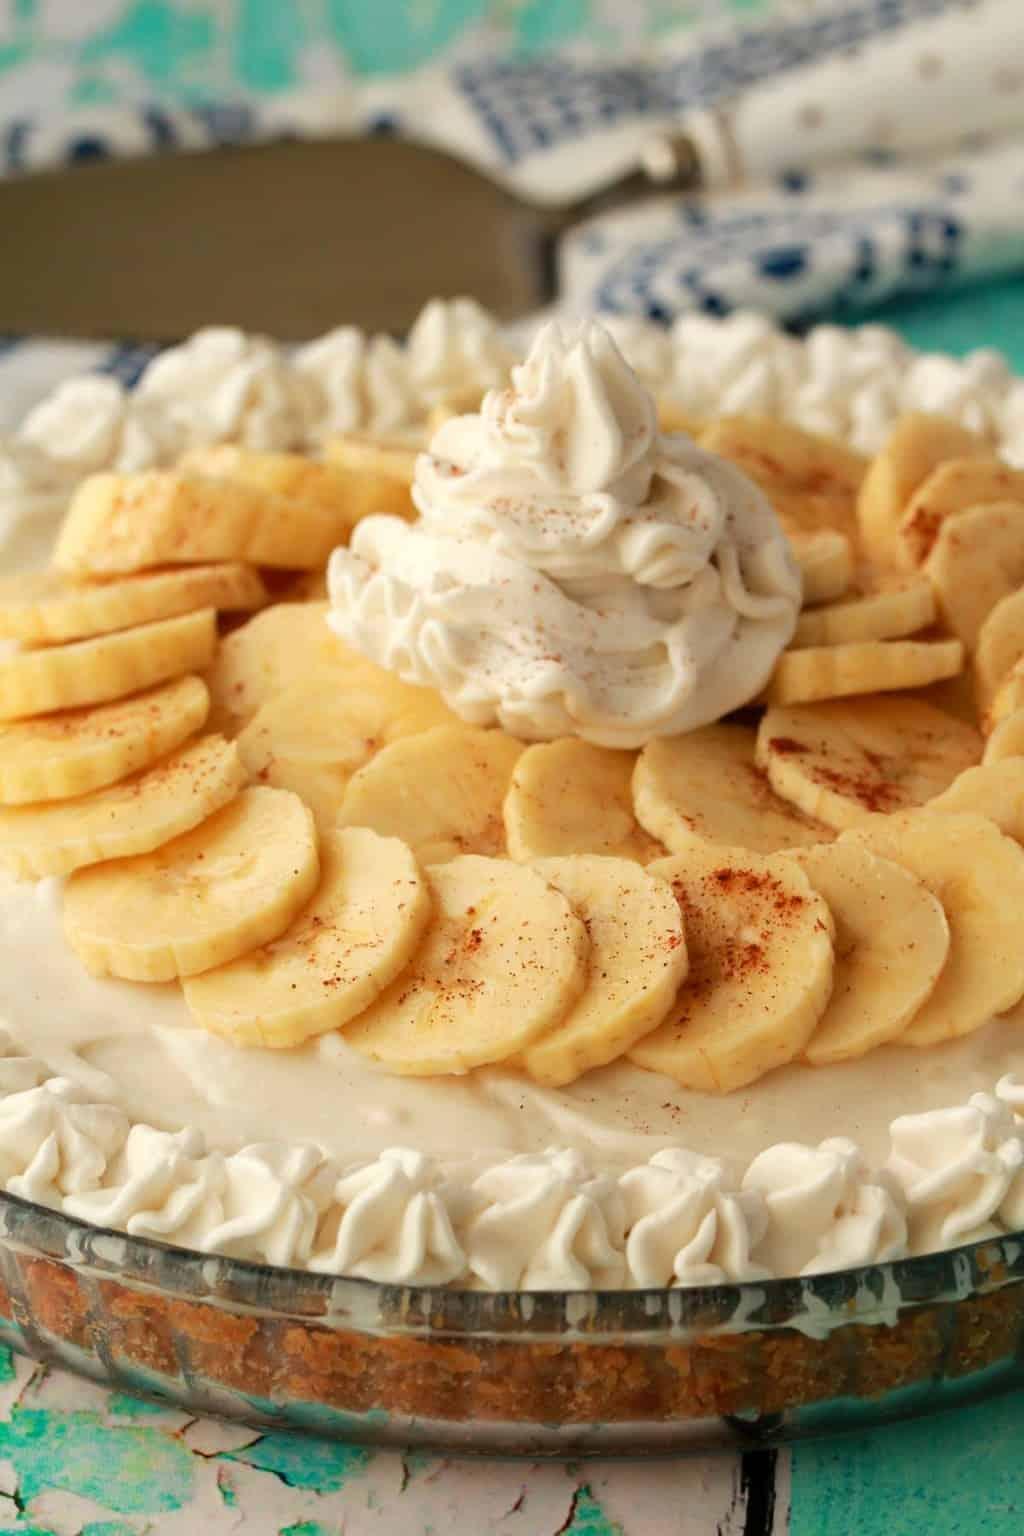 Vegan Banana Cream Pie! A deliciously rich and creamy pie set on top of a golden oreo crust, with sliced banana, vanilla cream pudding and vegan whipped cream! #vegan #lovingitvegan #dessert #pie #dairyfree #bananacreampie